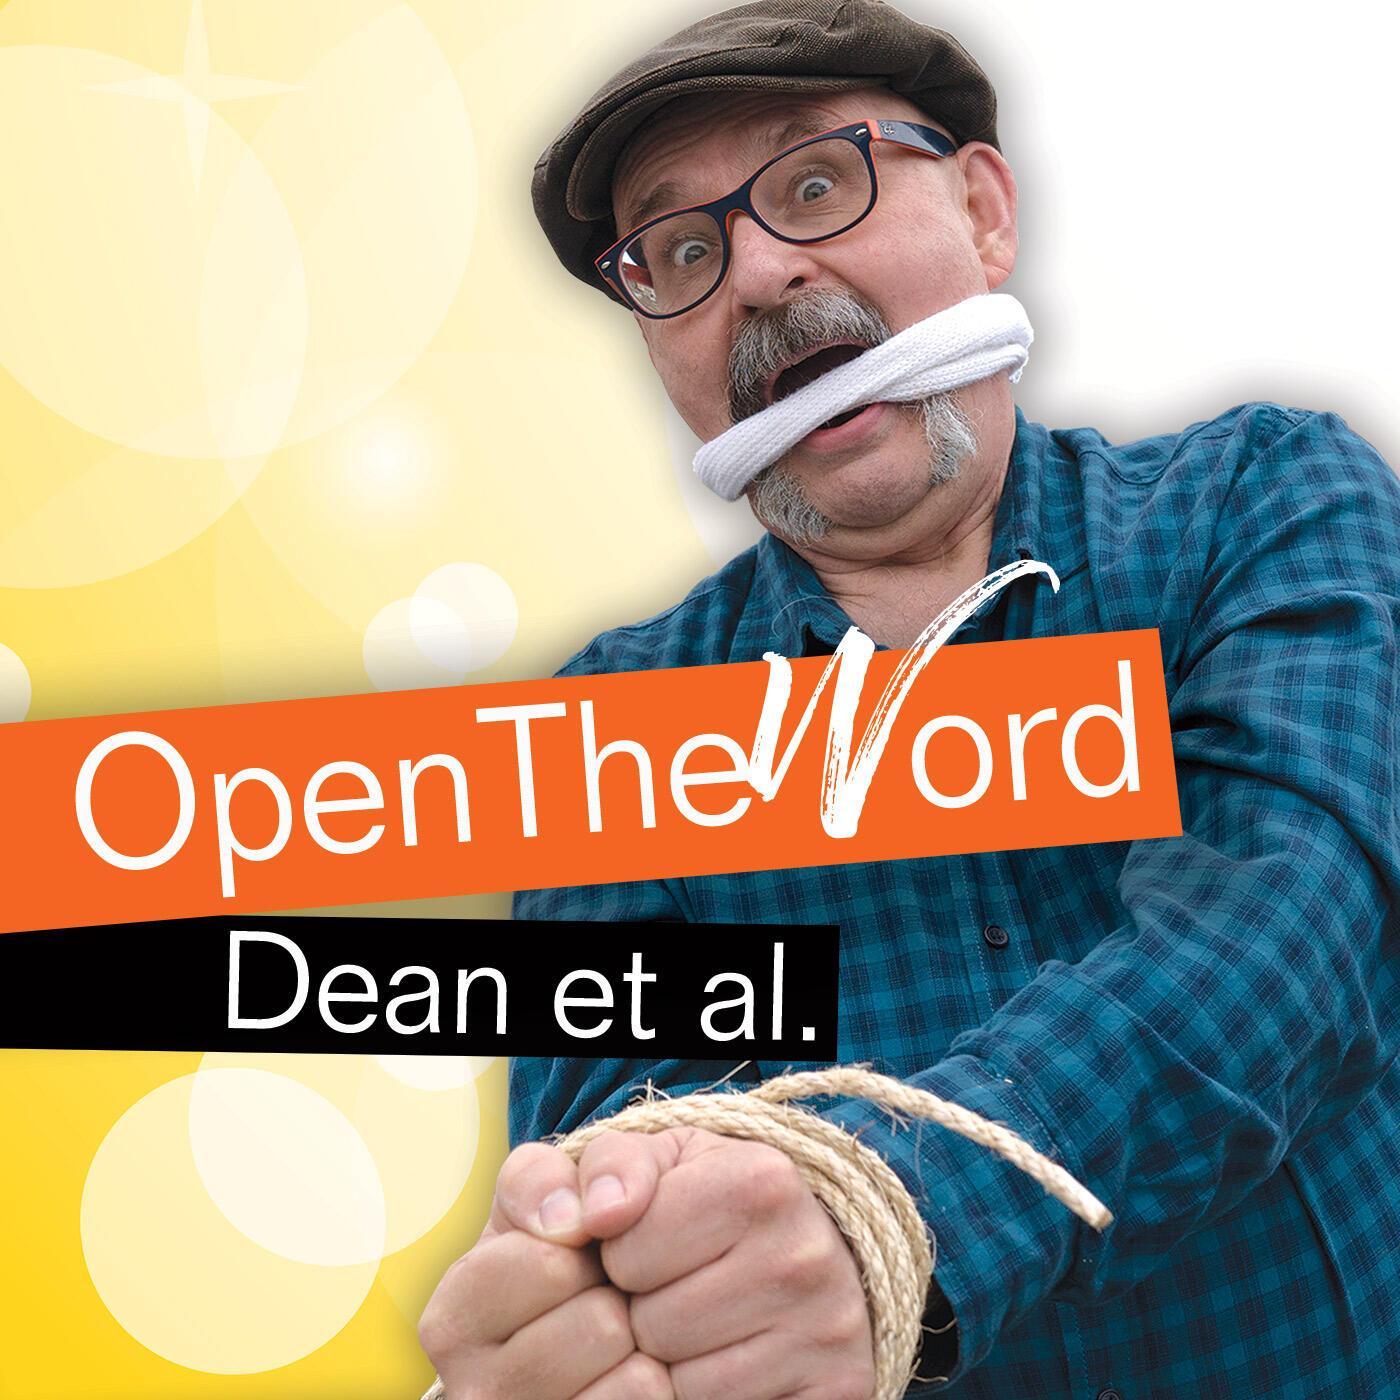 OpentheWord.org